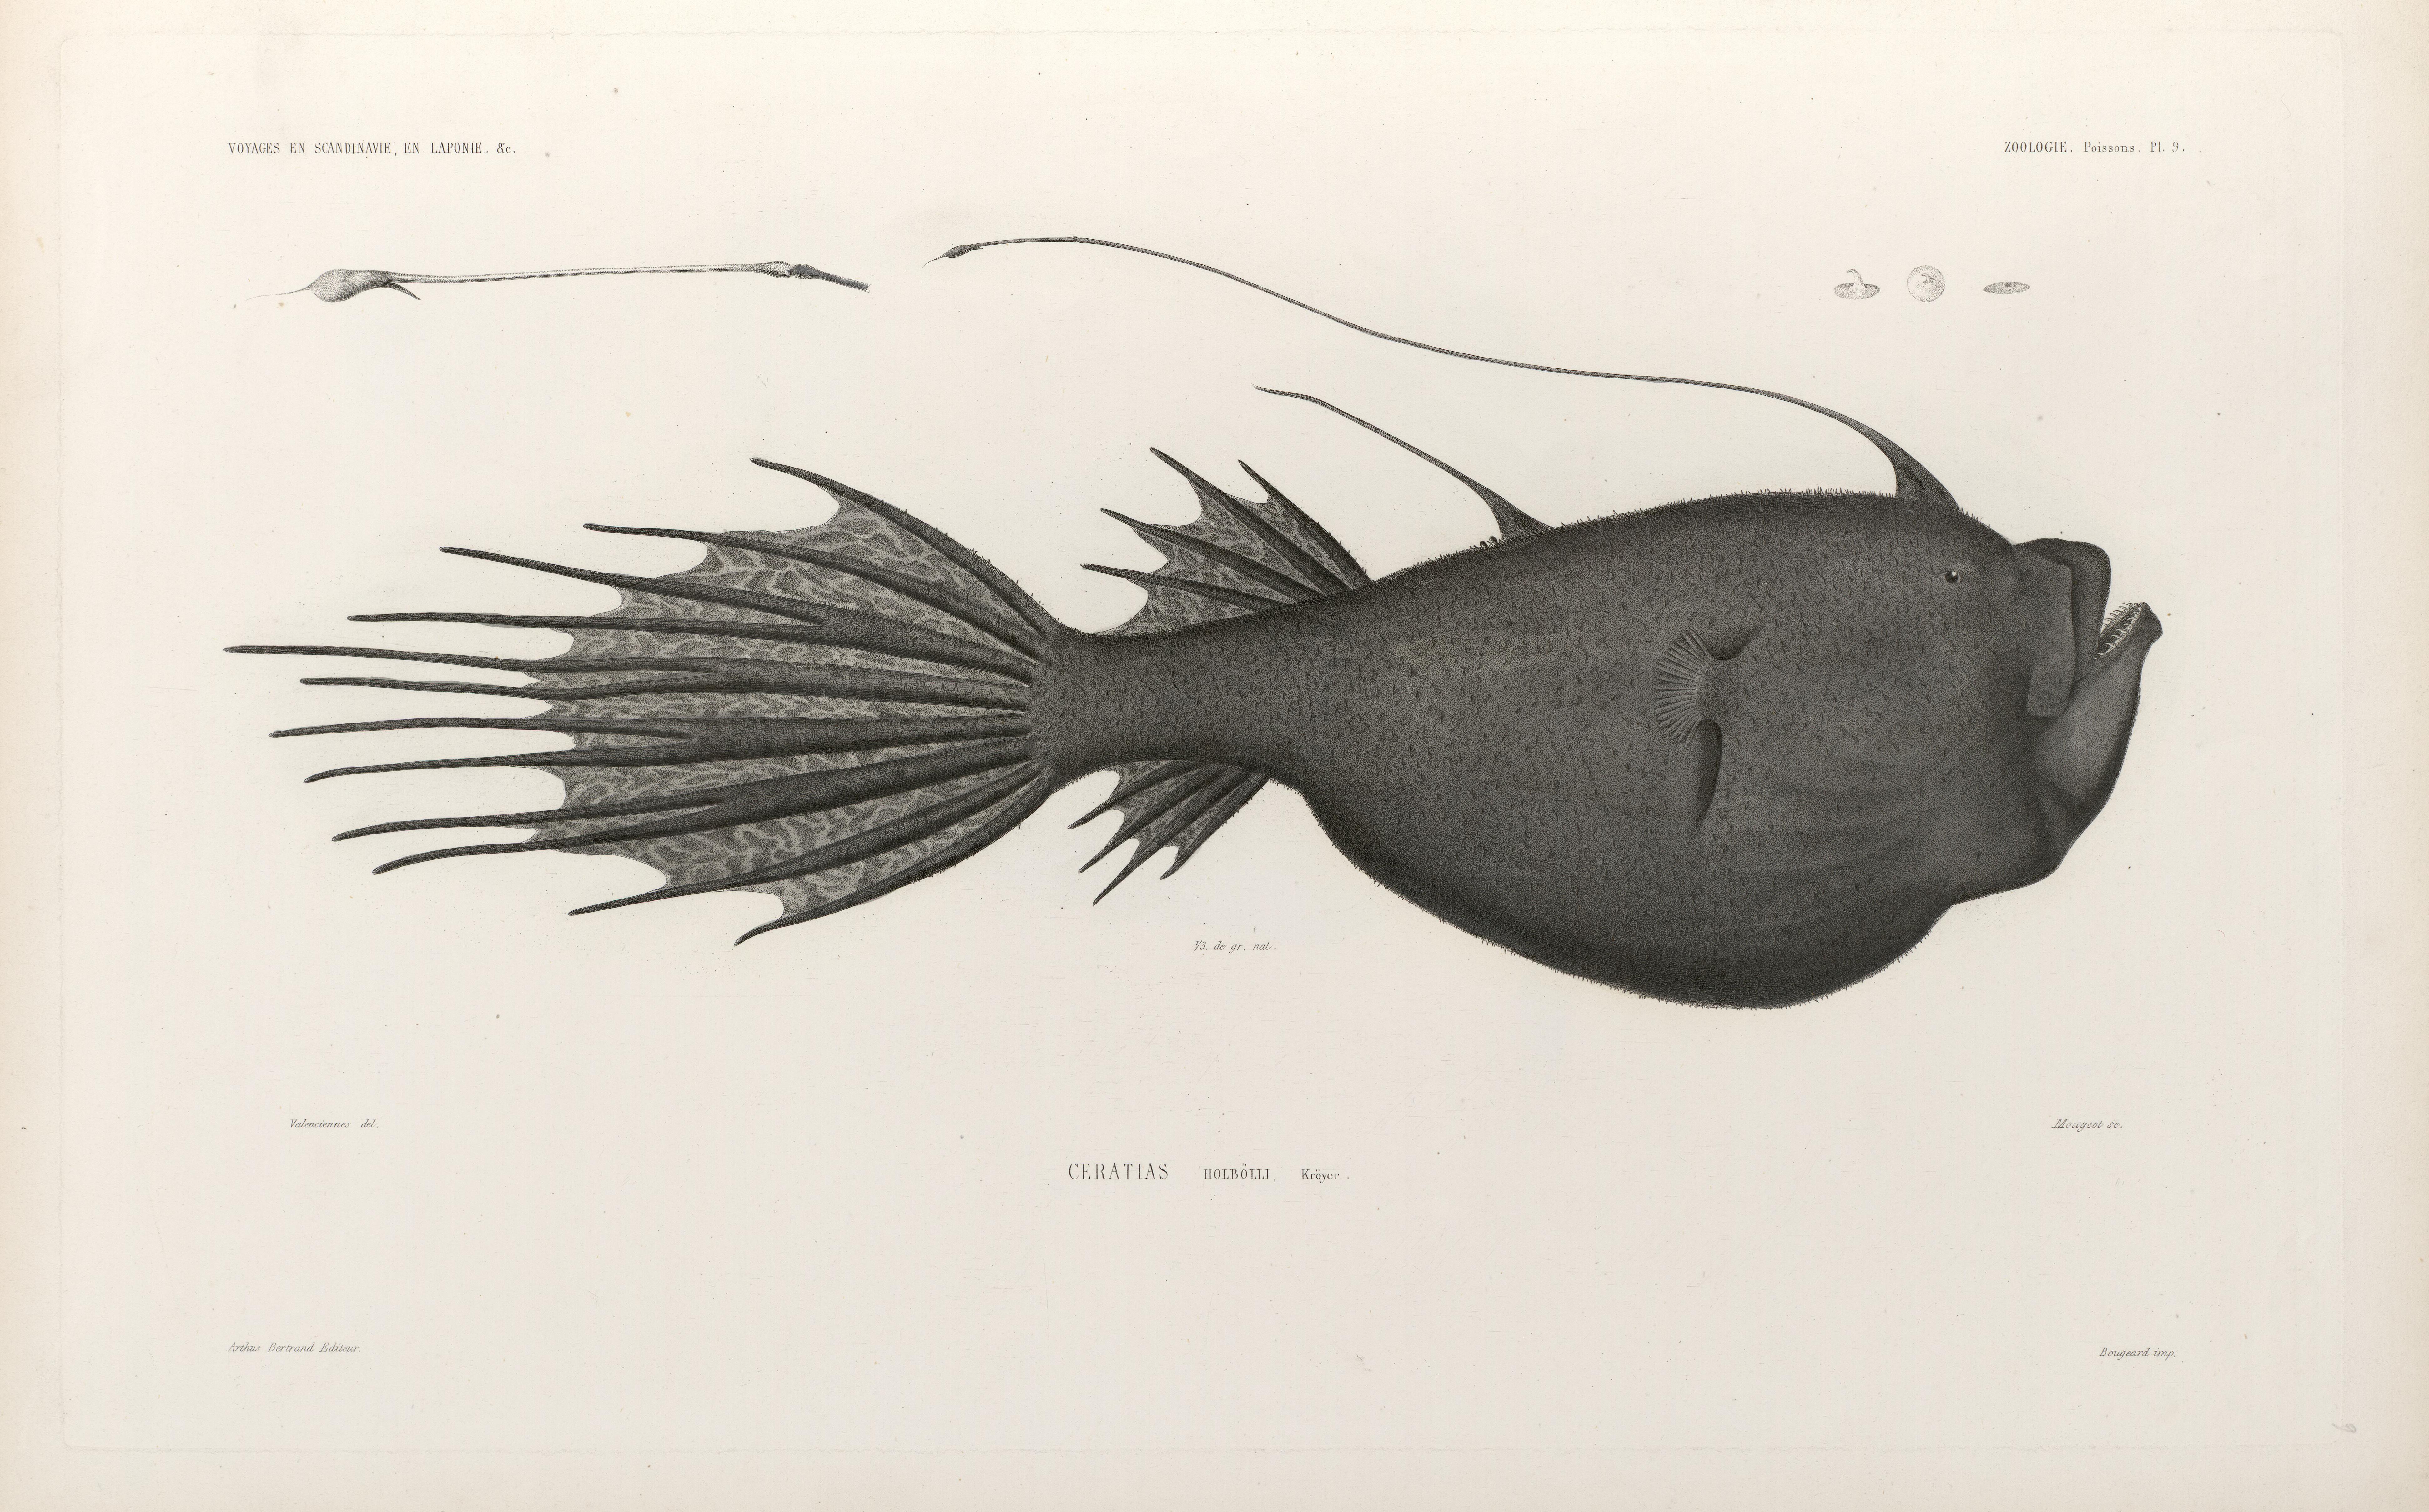 Image of Deepsea Angler